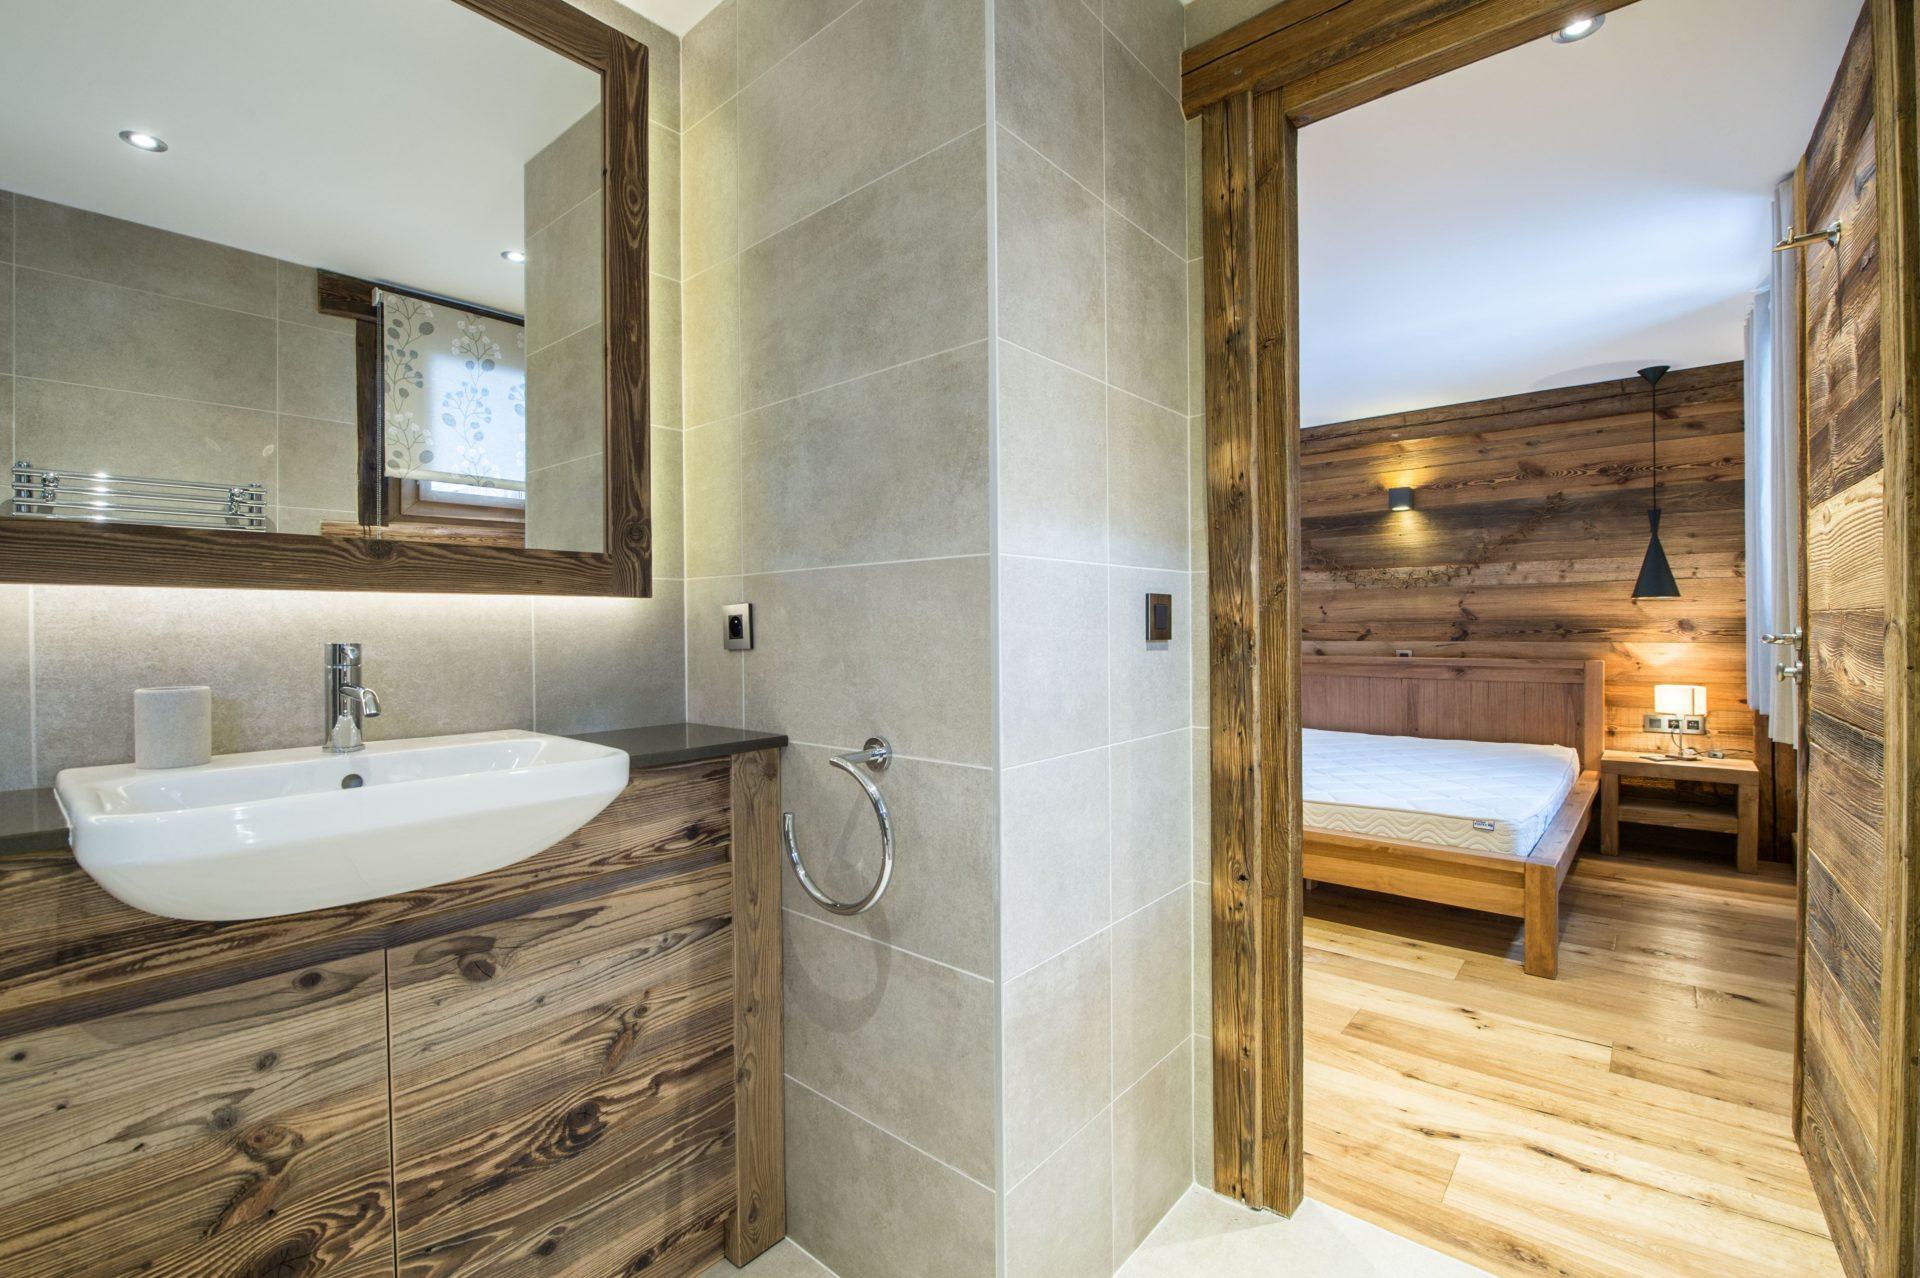 Chalet Chanterelle Salle de bain 2 Villarabout Saint Martin de Belleville, Savoie